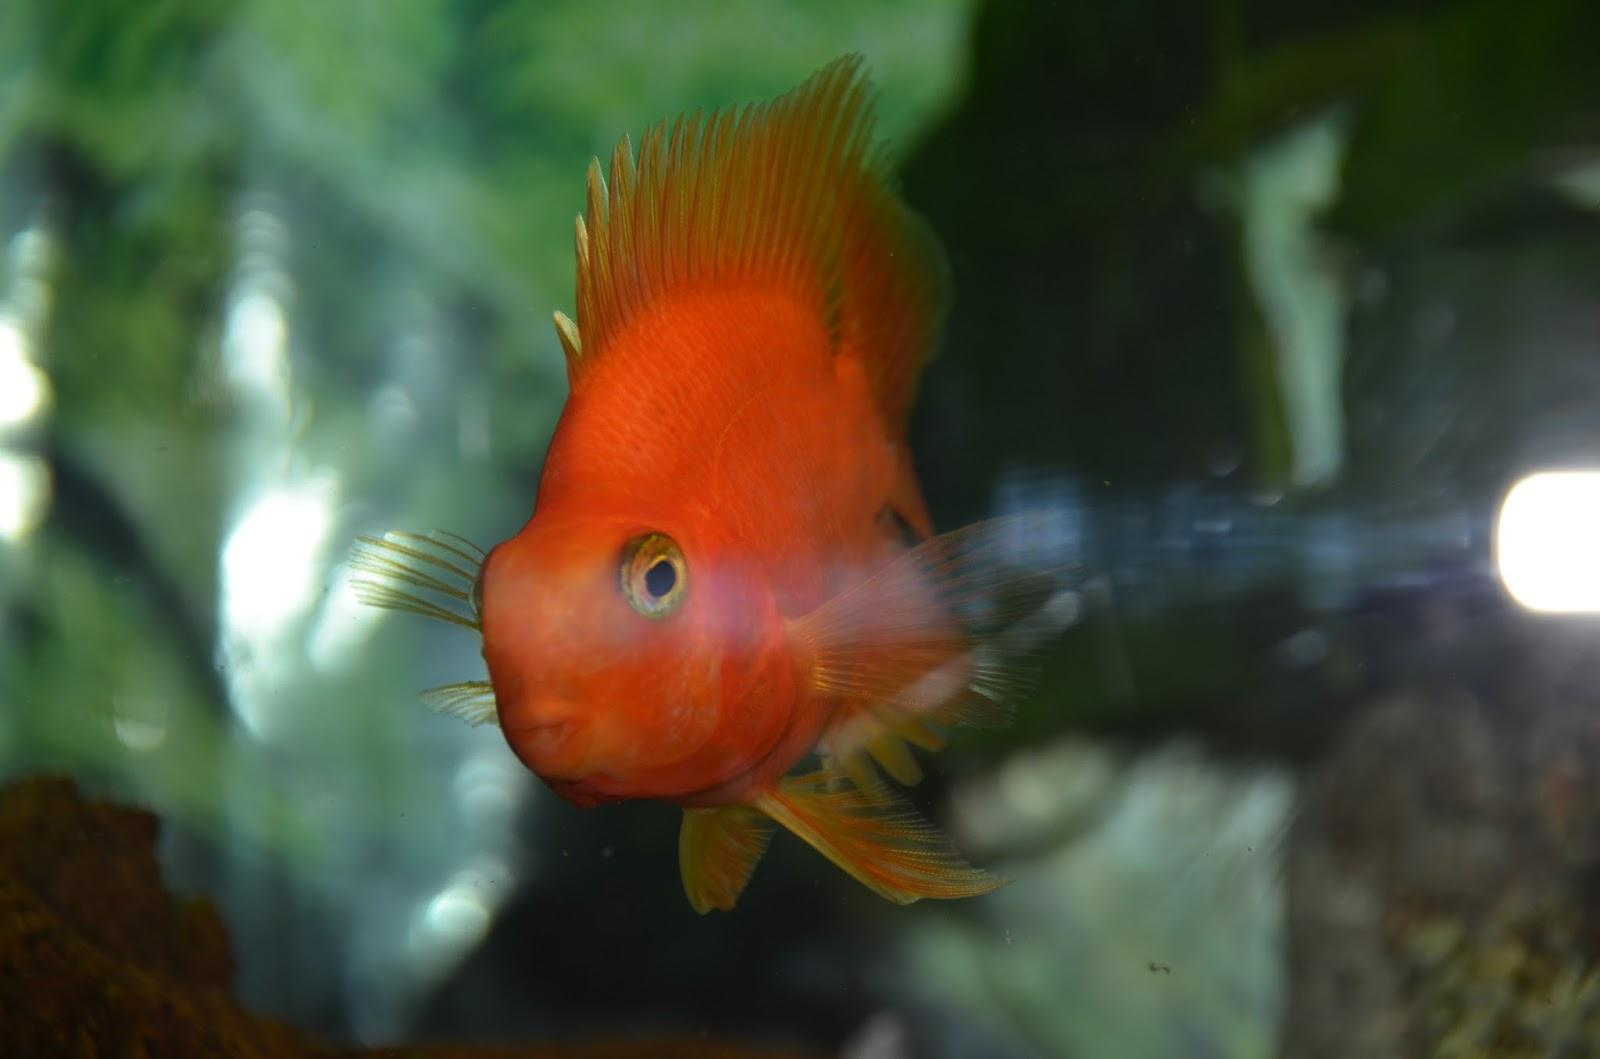 Animalerie cartierville poissons for Animalerie poisson